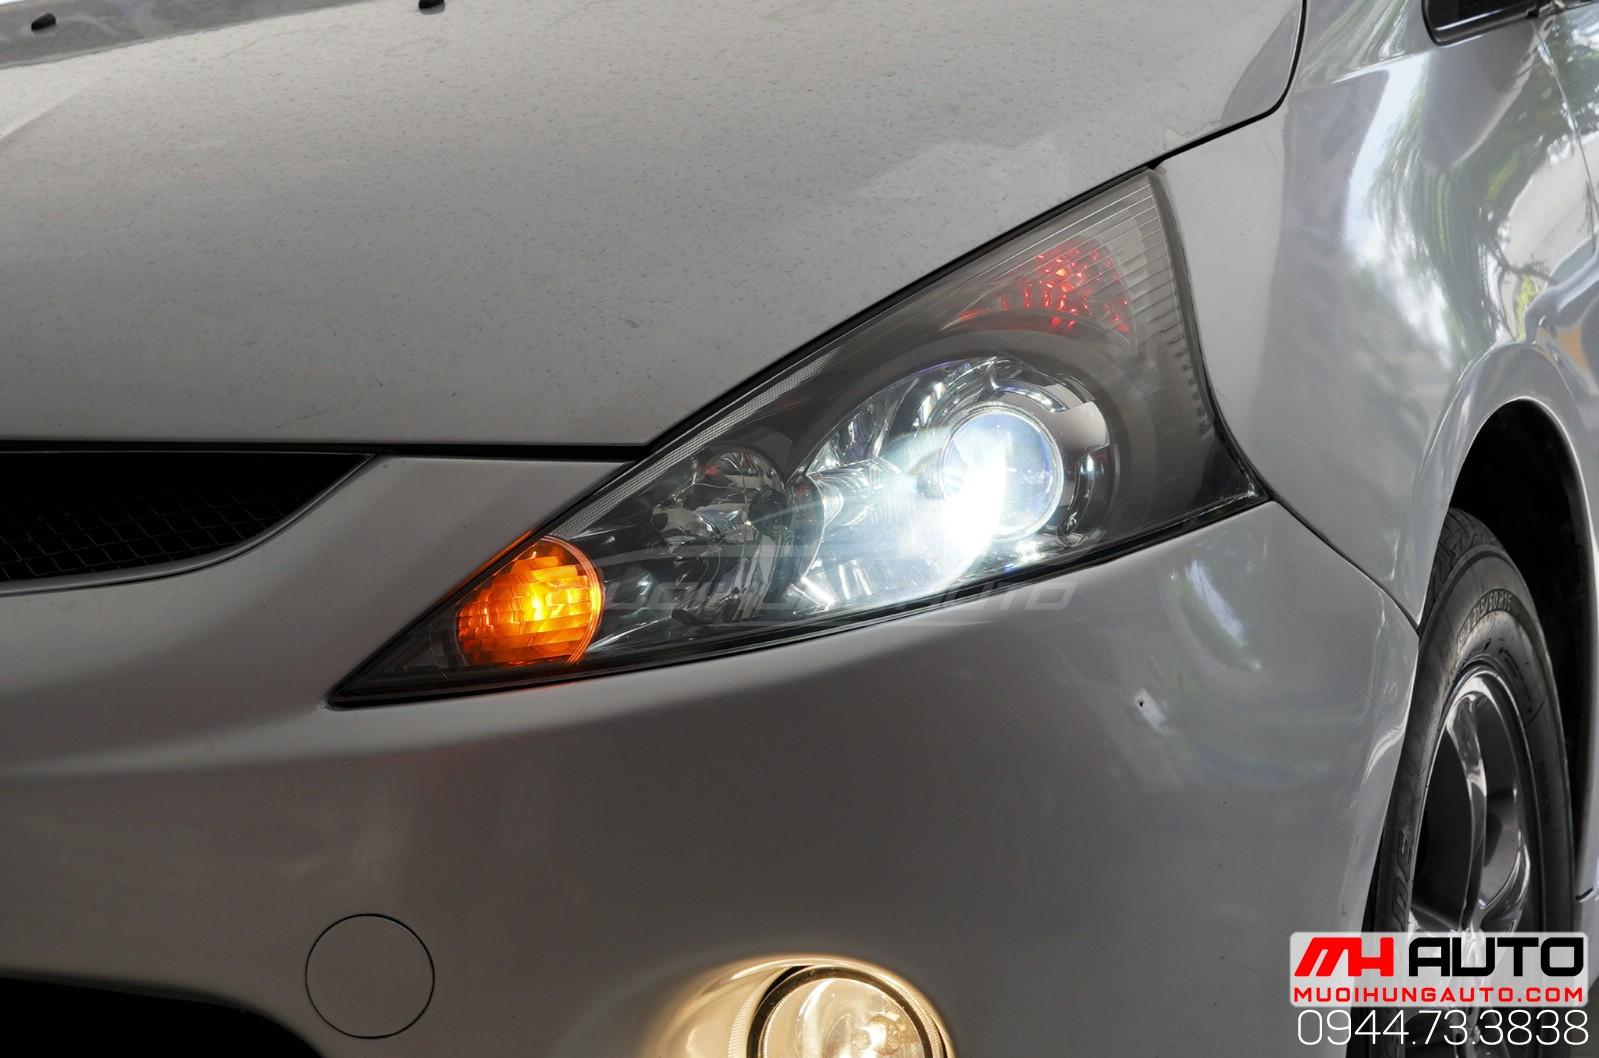 Độ đèn gầm bi cho xe Mitsubishi Grandis